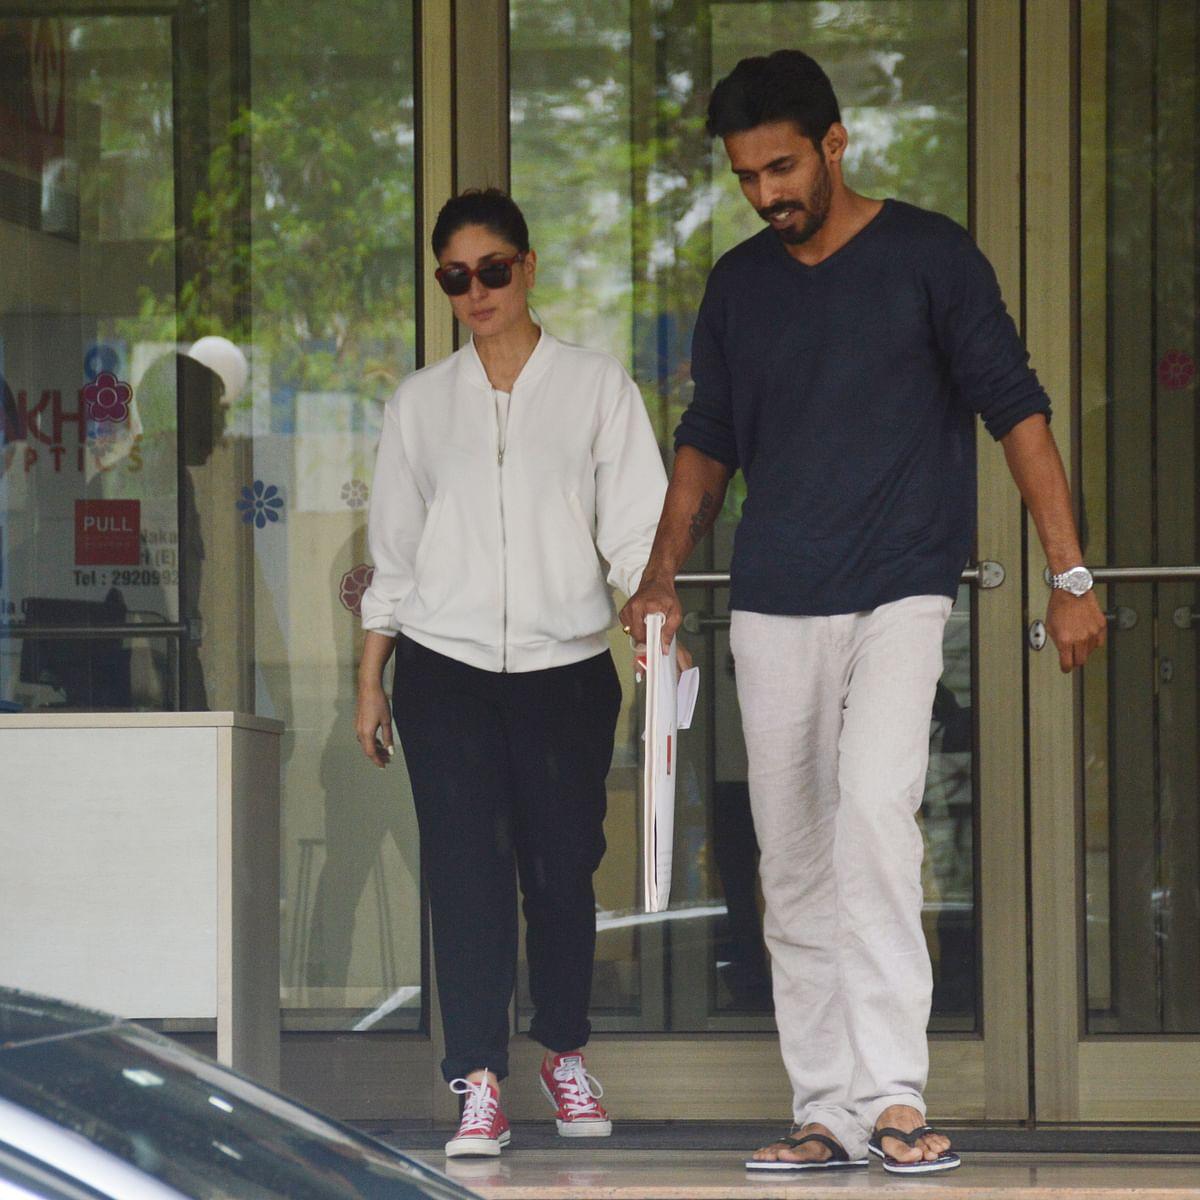 Kareena leaving the hospital (Photo: Yogen Shah)